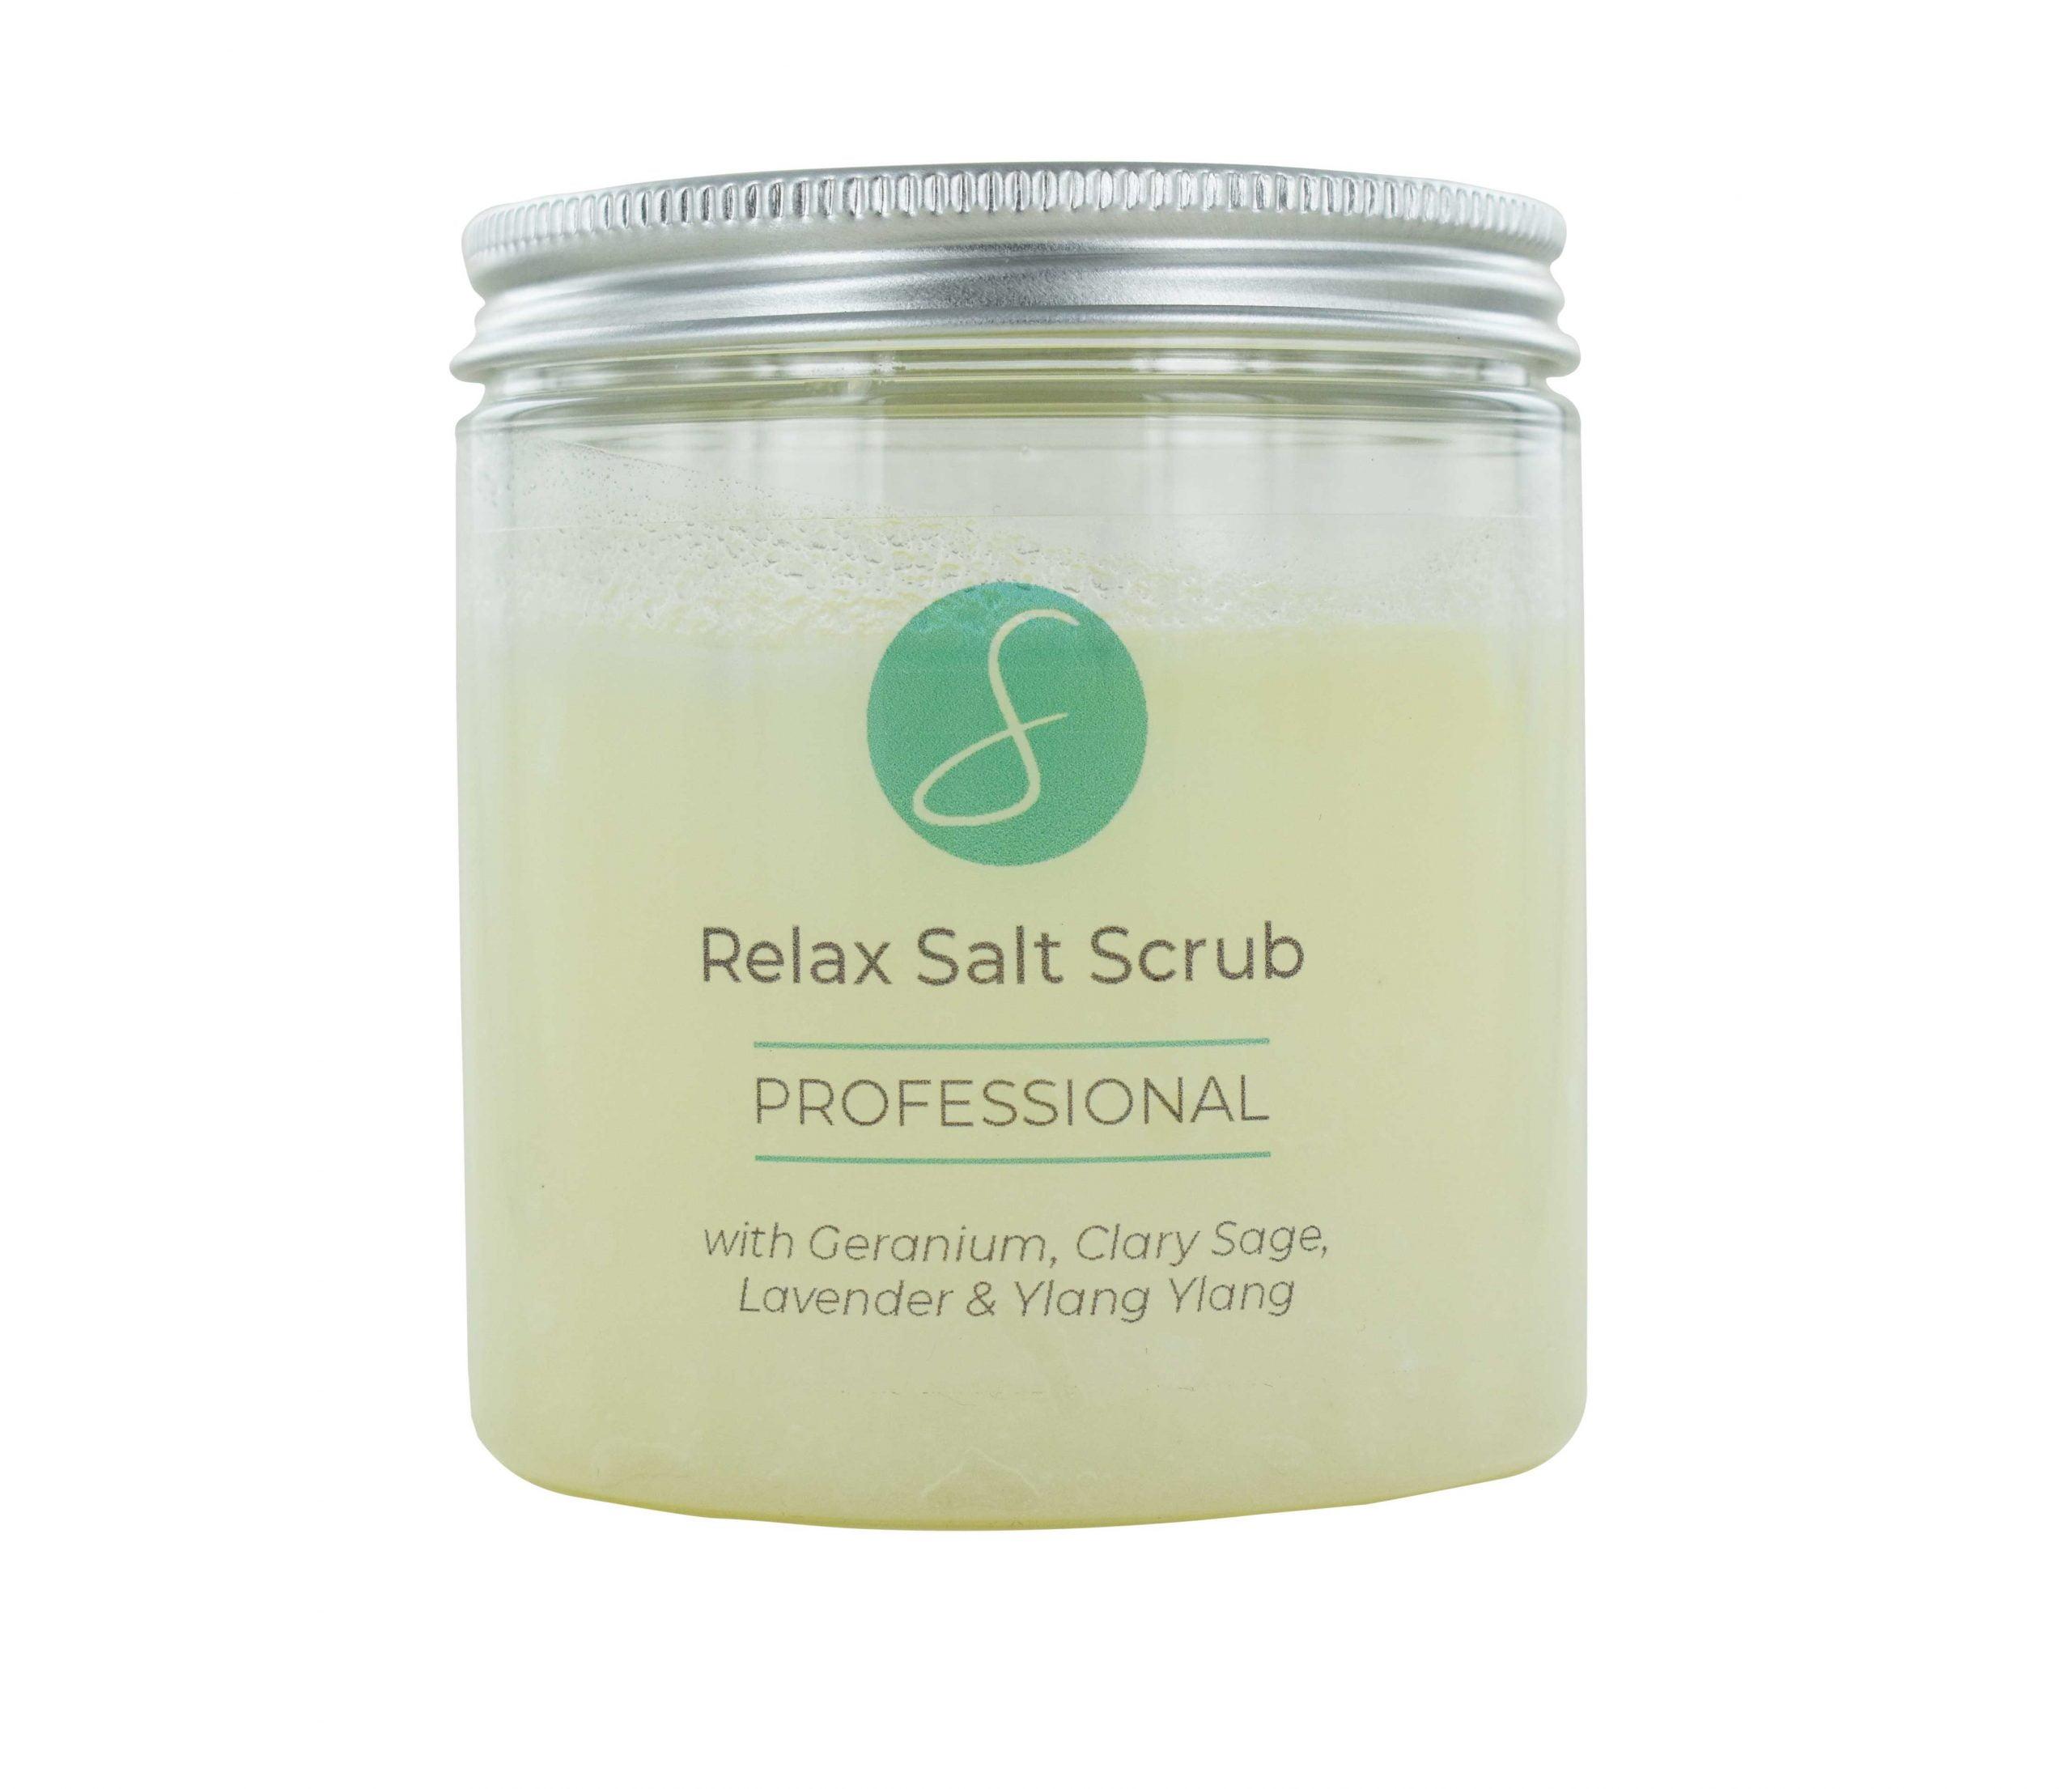 Relax Salt Scrub